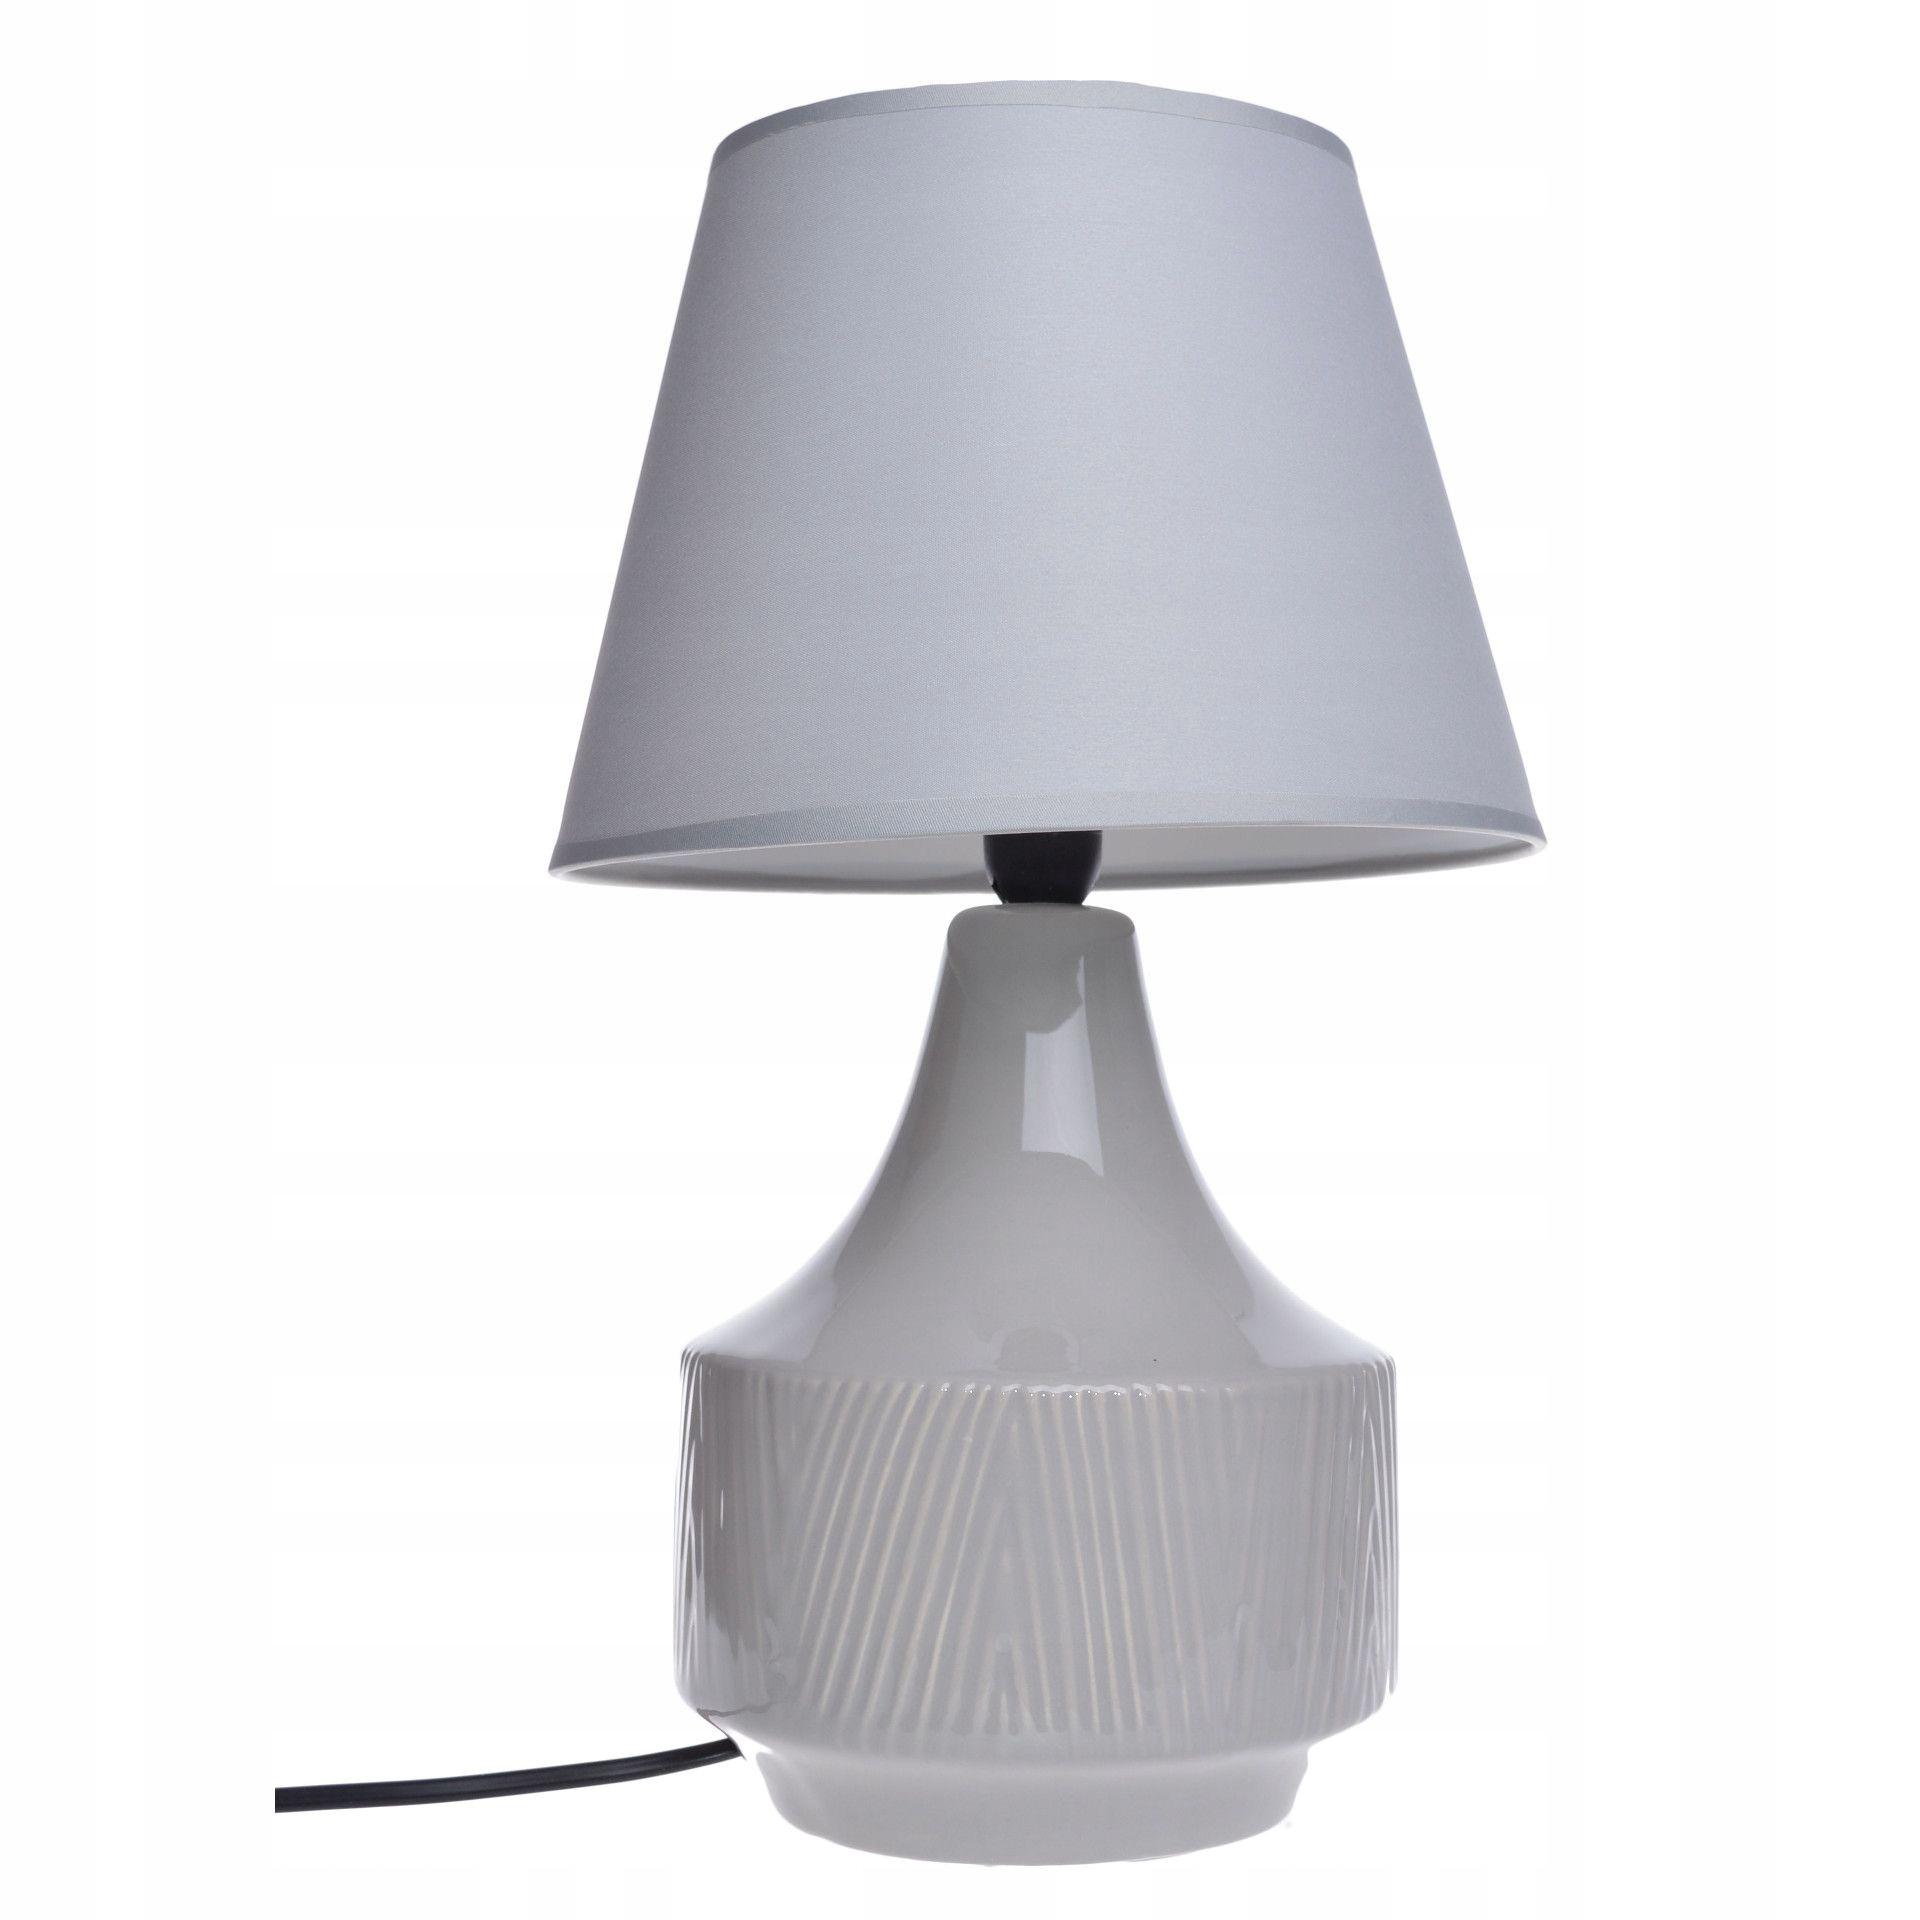 Stolná lampa Vibor sivá retro 36 cm na Stôl